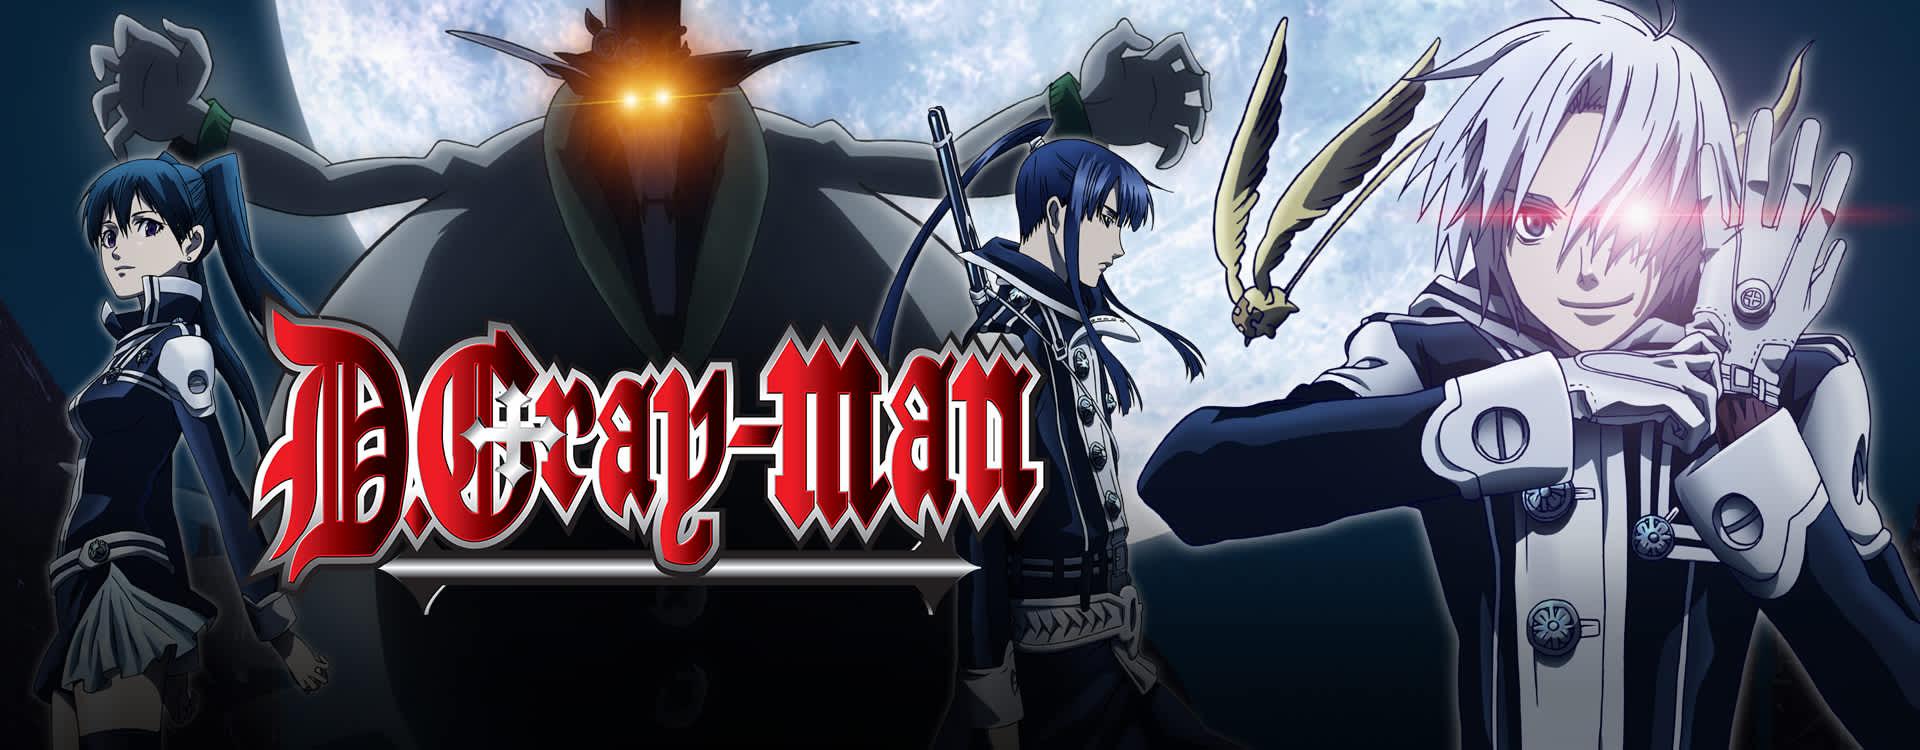 stream amp watch d gray man episodes online   sub amp dub